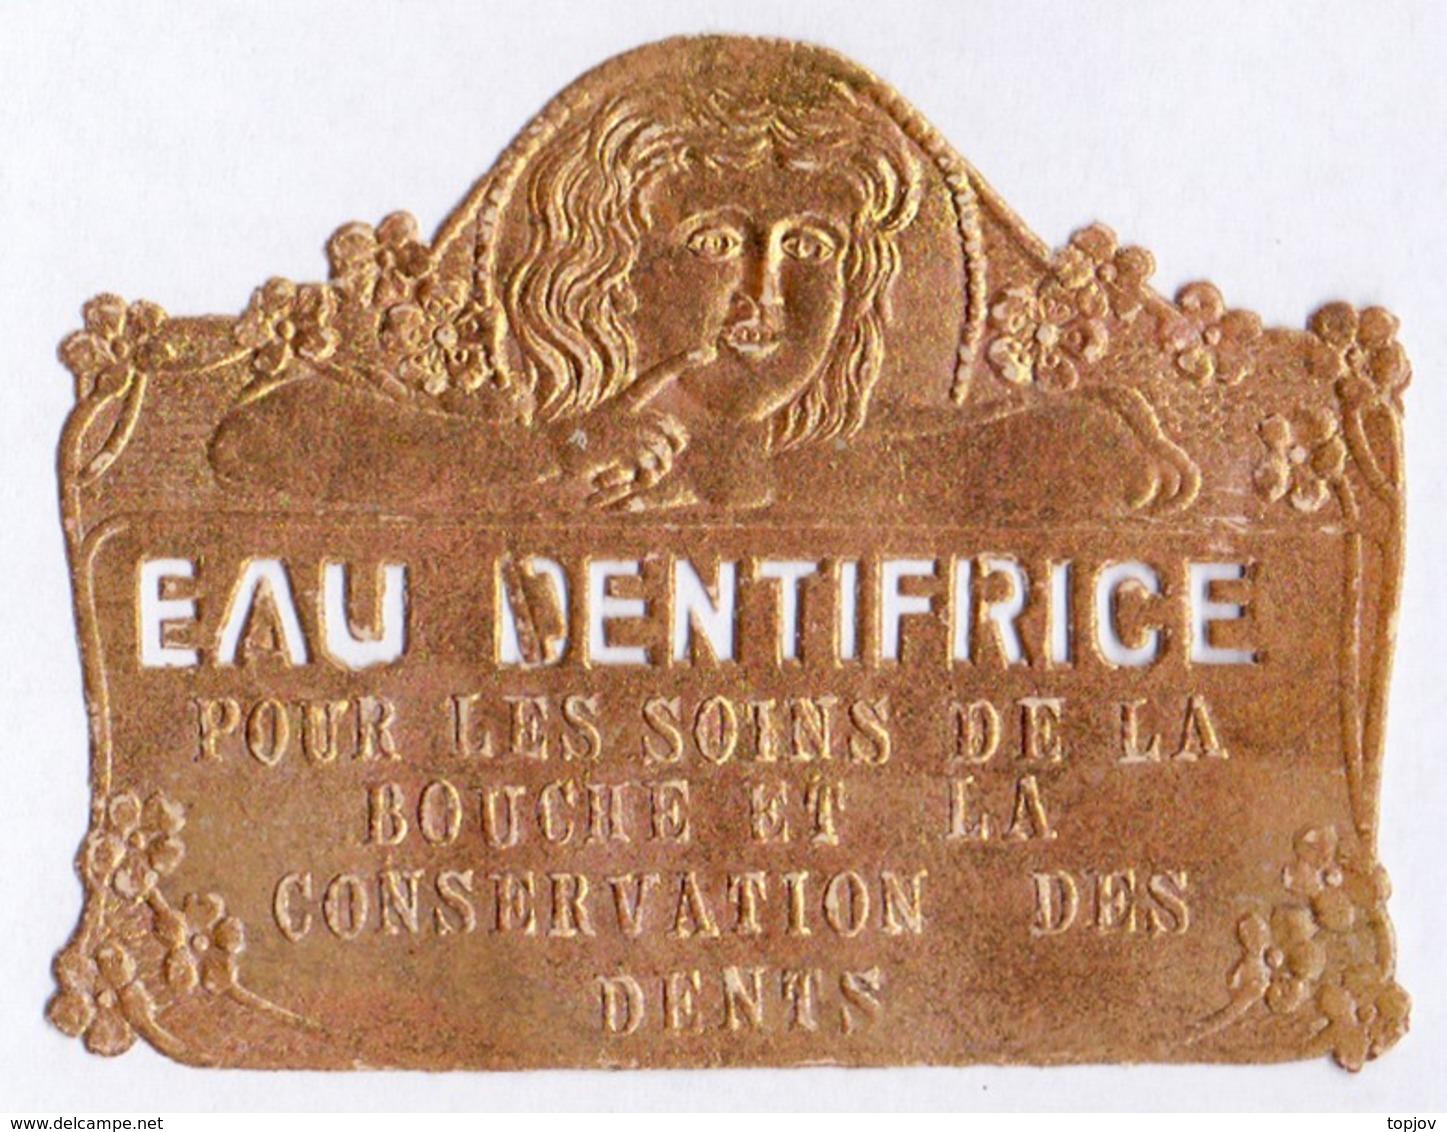 PRINT From J. STERN BERLIN - EUA  DENTIFRICE  On GOLD Folie - Cc 1910/15 - Labels